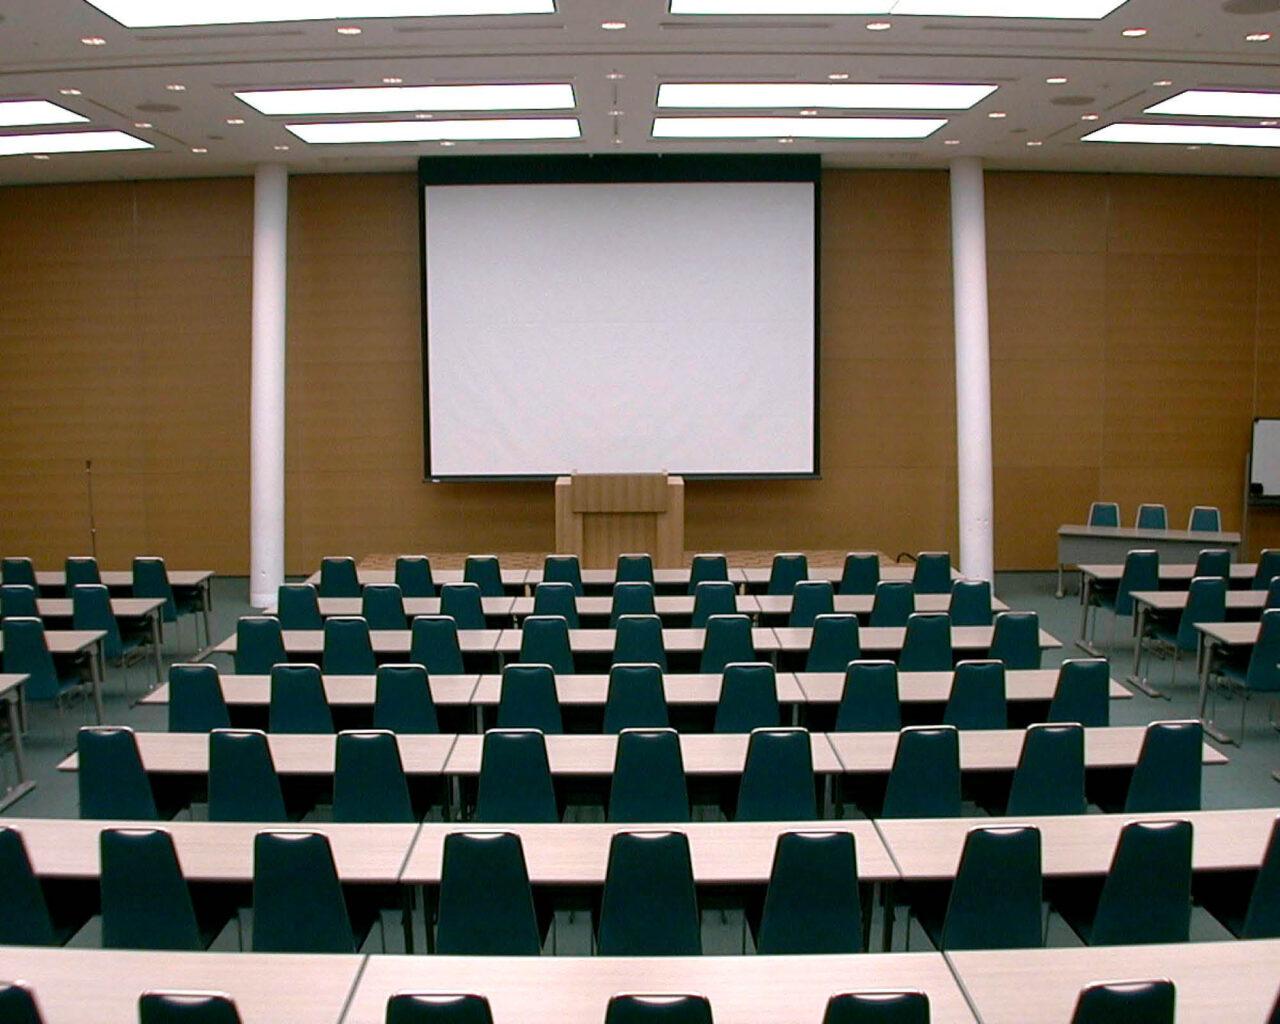 https://www.shizuoka-cb.com/wp-content/uploads/2021/03/photo-venues7-1280x1024.jpg